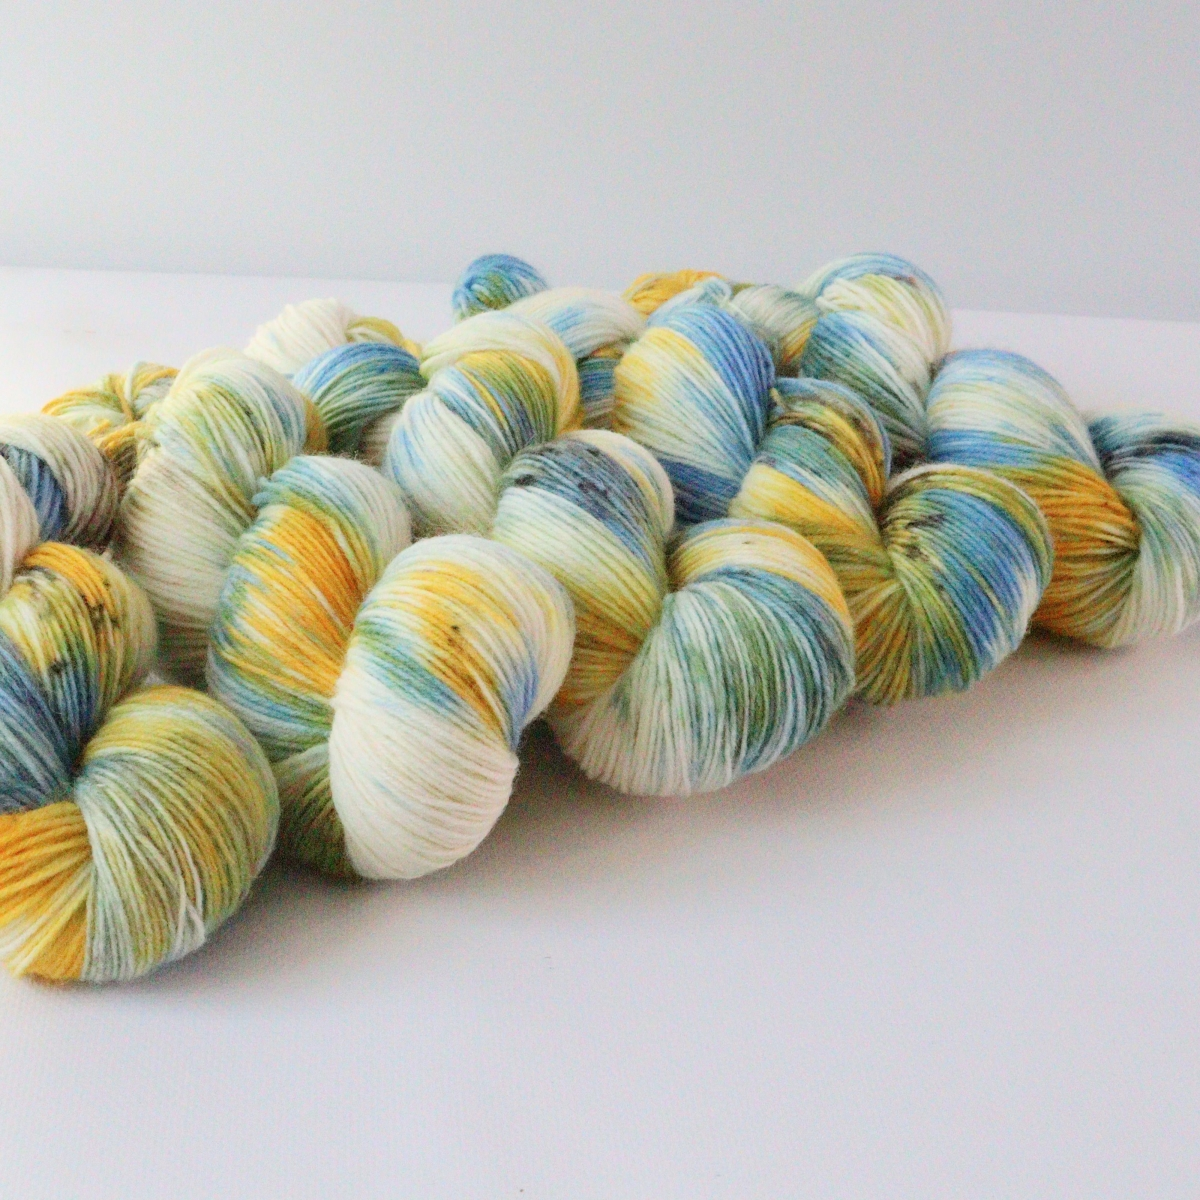 woodico.pro hand dyed yarn 087 3 1200x1200 - Hand dyed yarn / 087